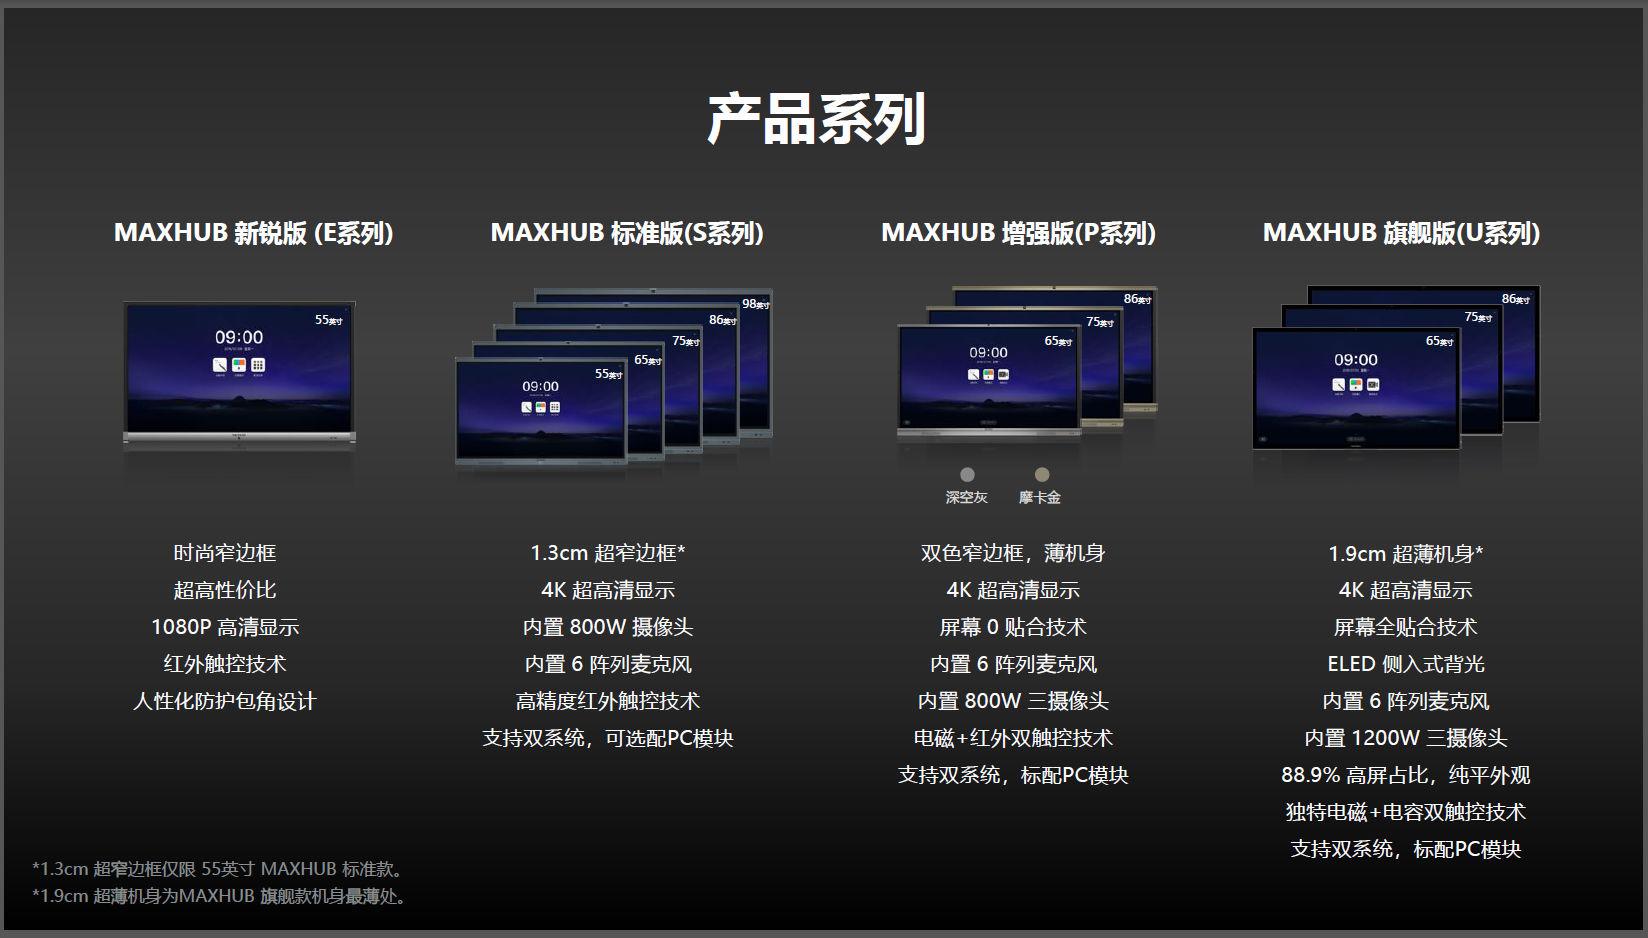 MAXHUB会议平板产品系列